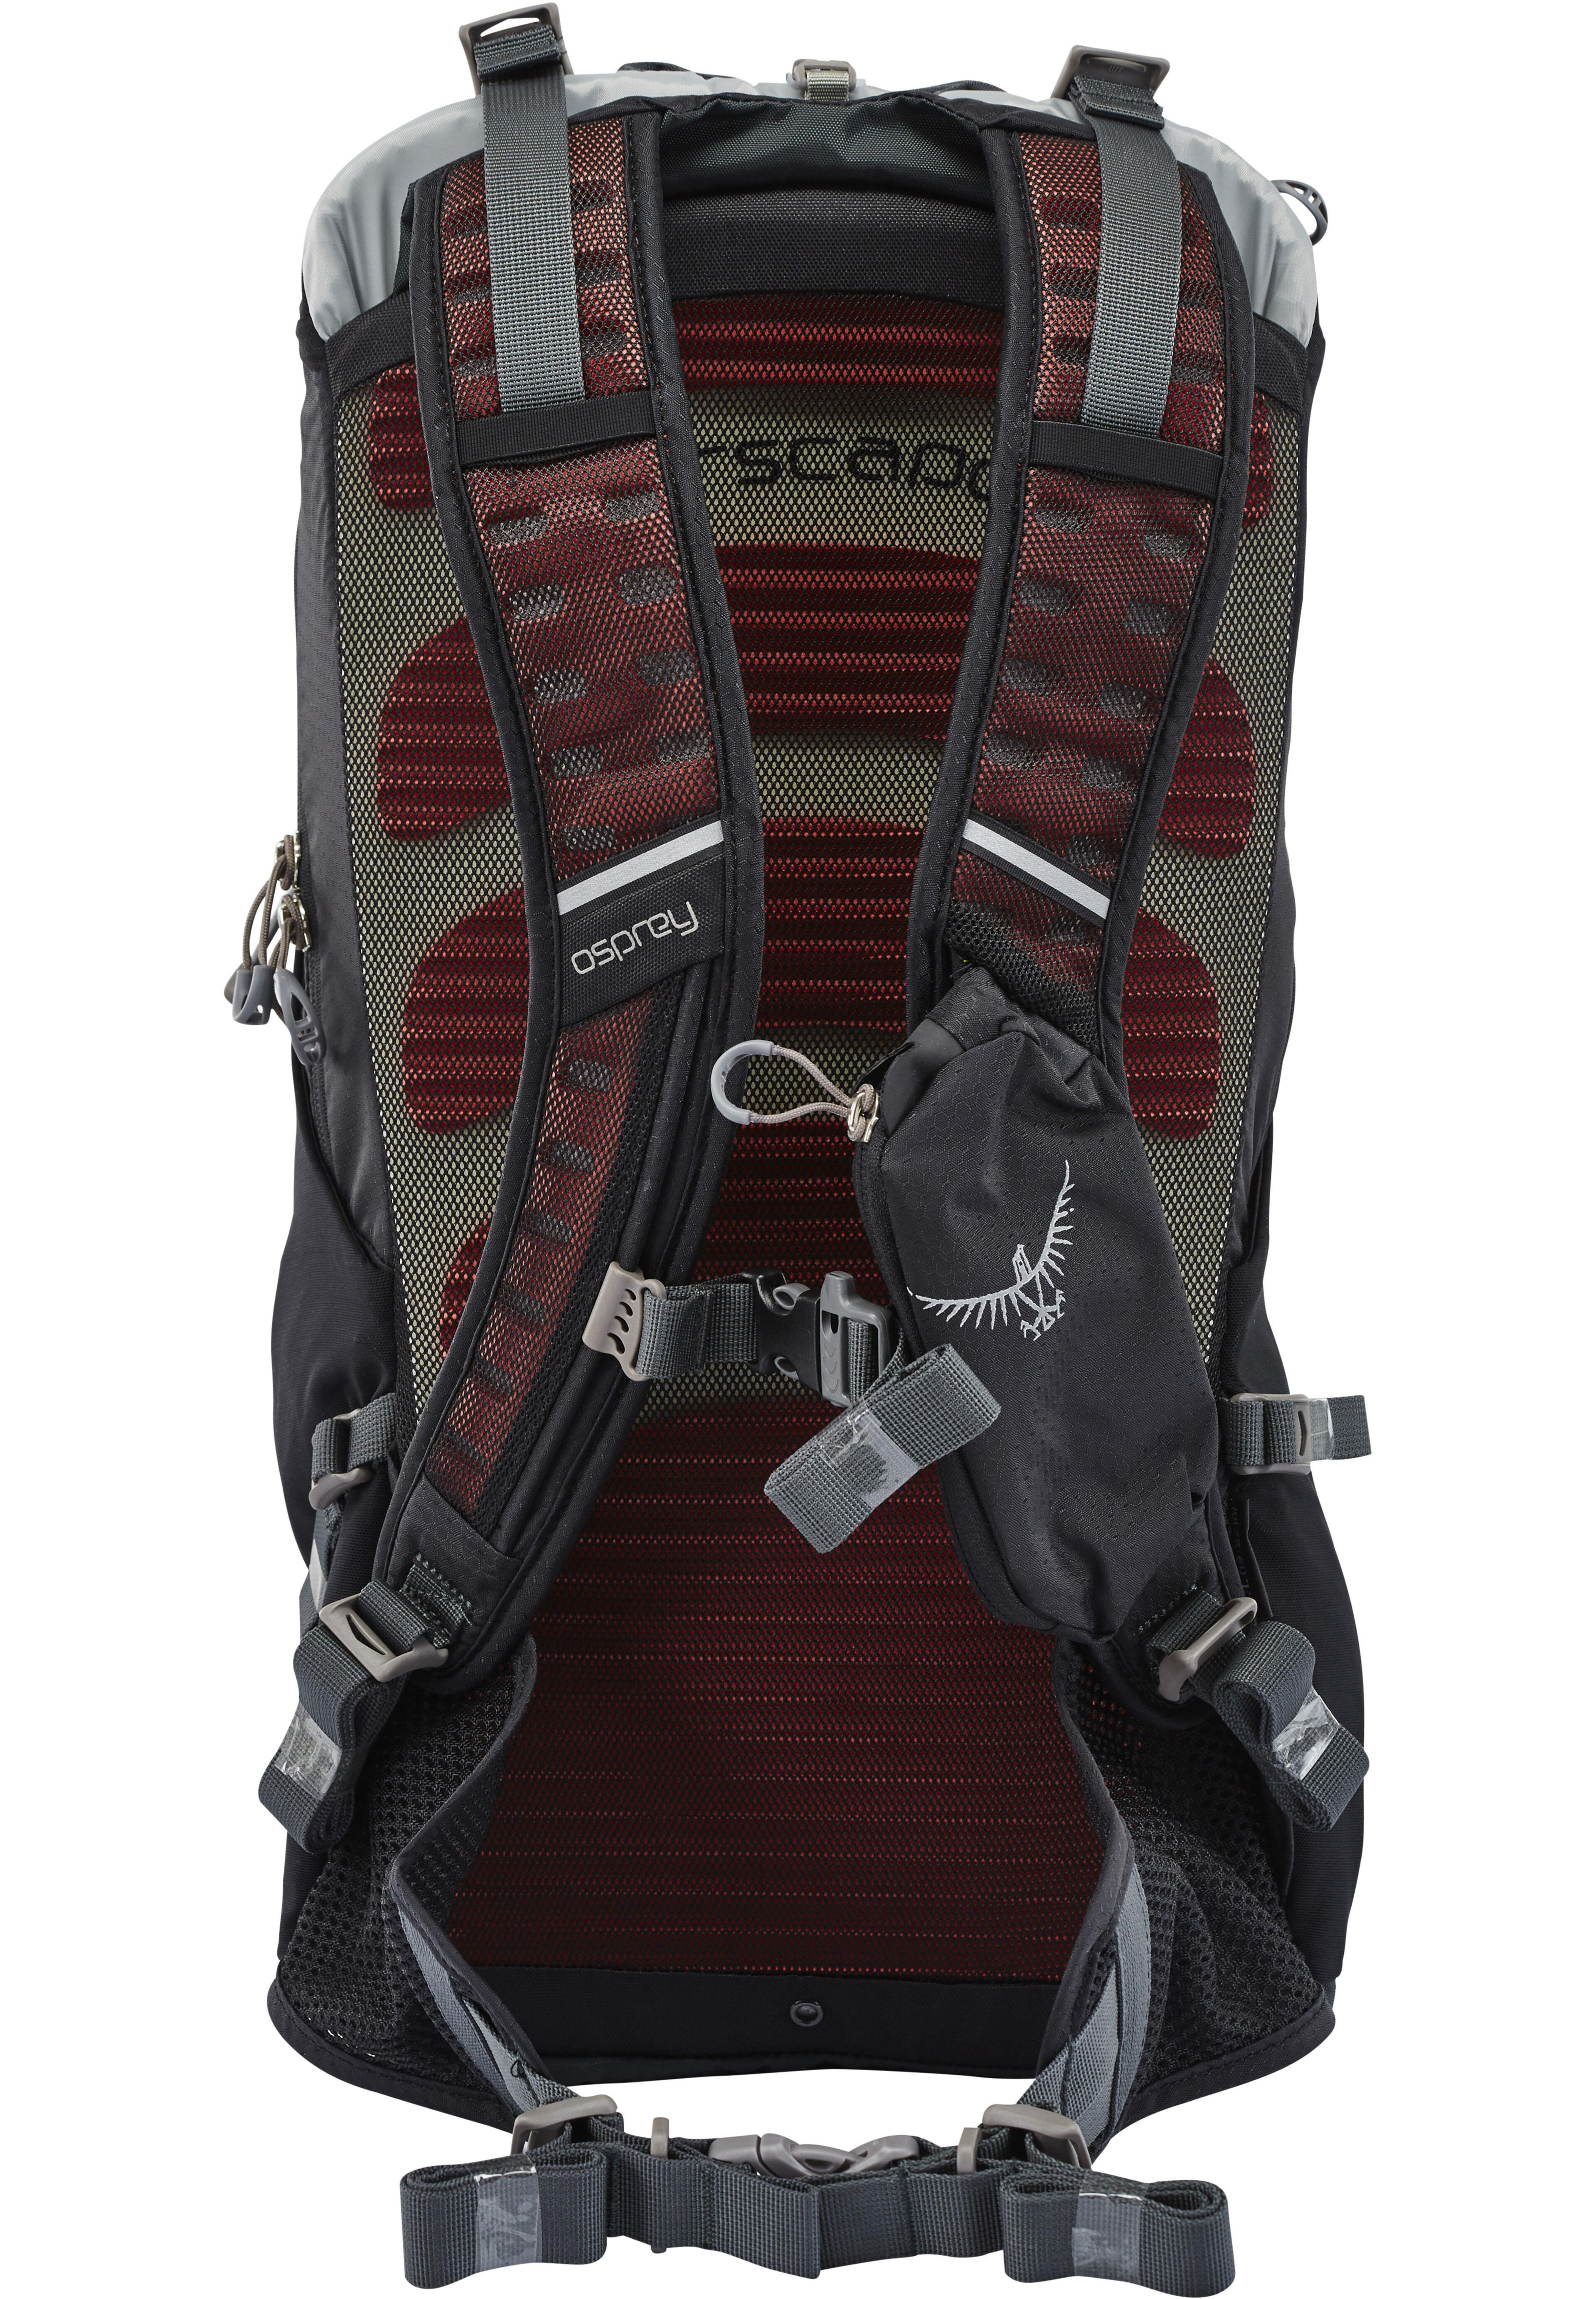 da74abcb2839d Osprey Escapist 18 Plecak M/L czarny | Sklep Bikester.pl